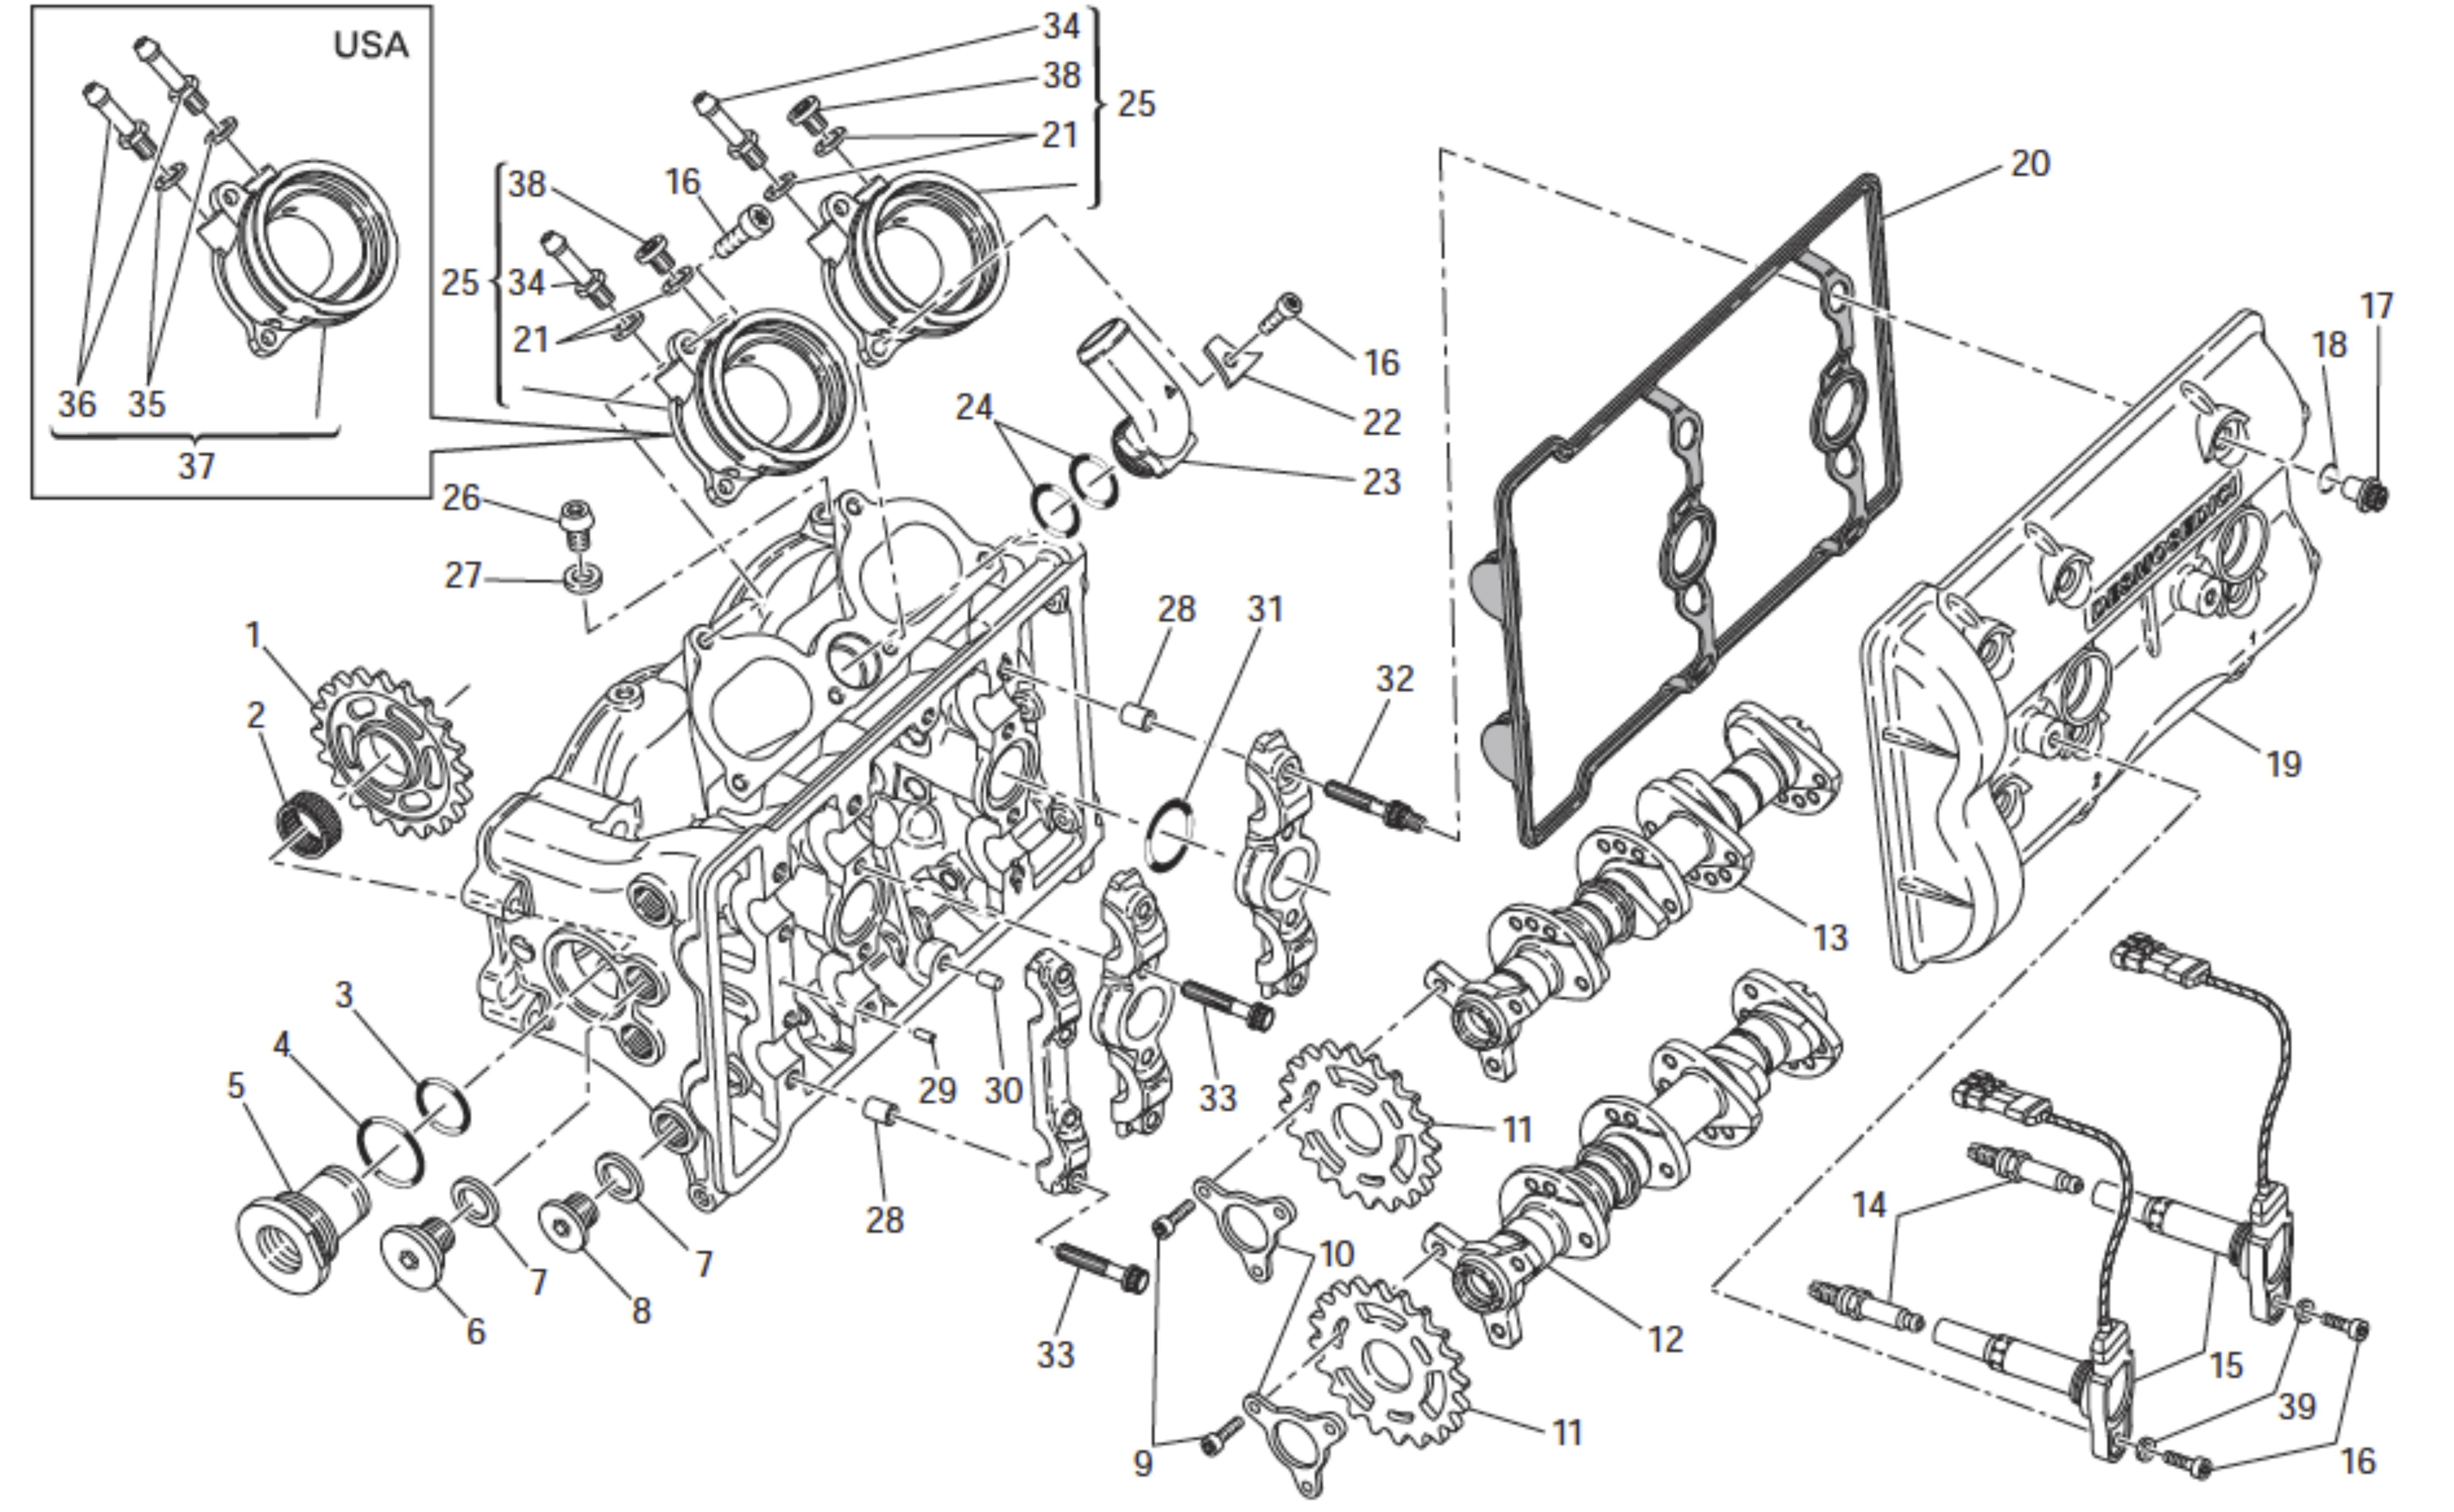 desmosedici replica bike build page 9 ducati org forum the rh ducati org Honda D15 Engine Honda Engine Diagram